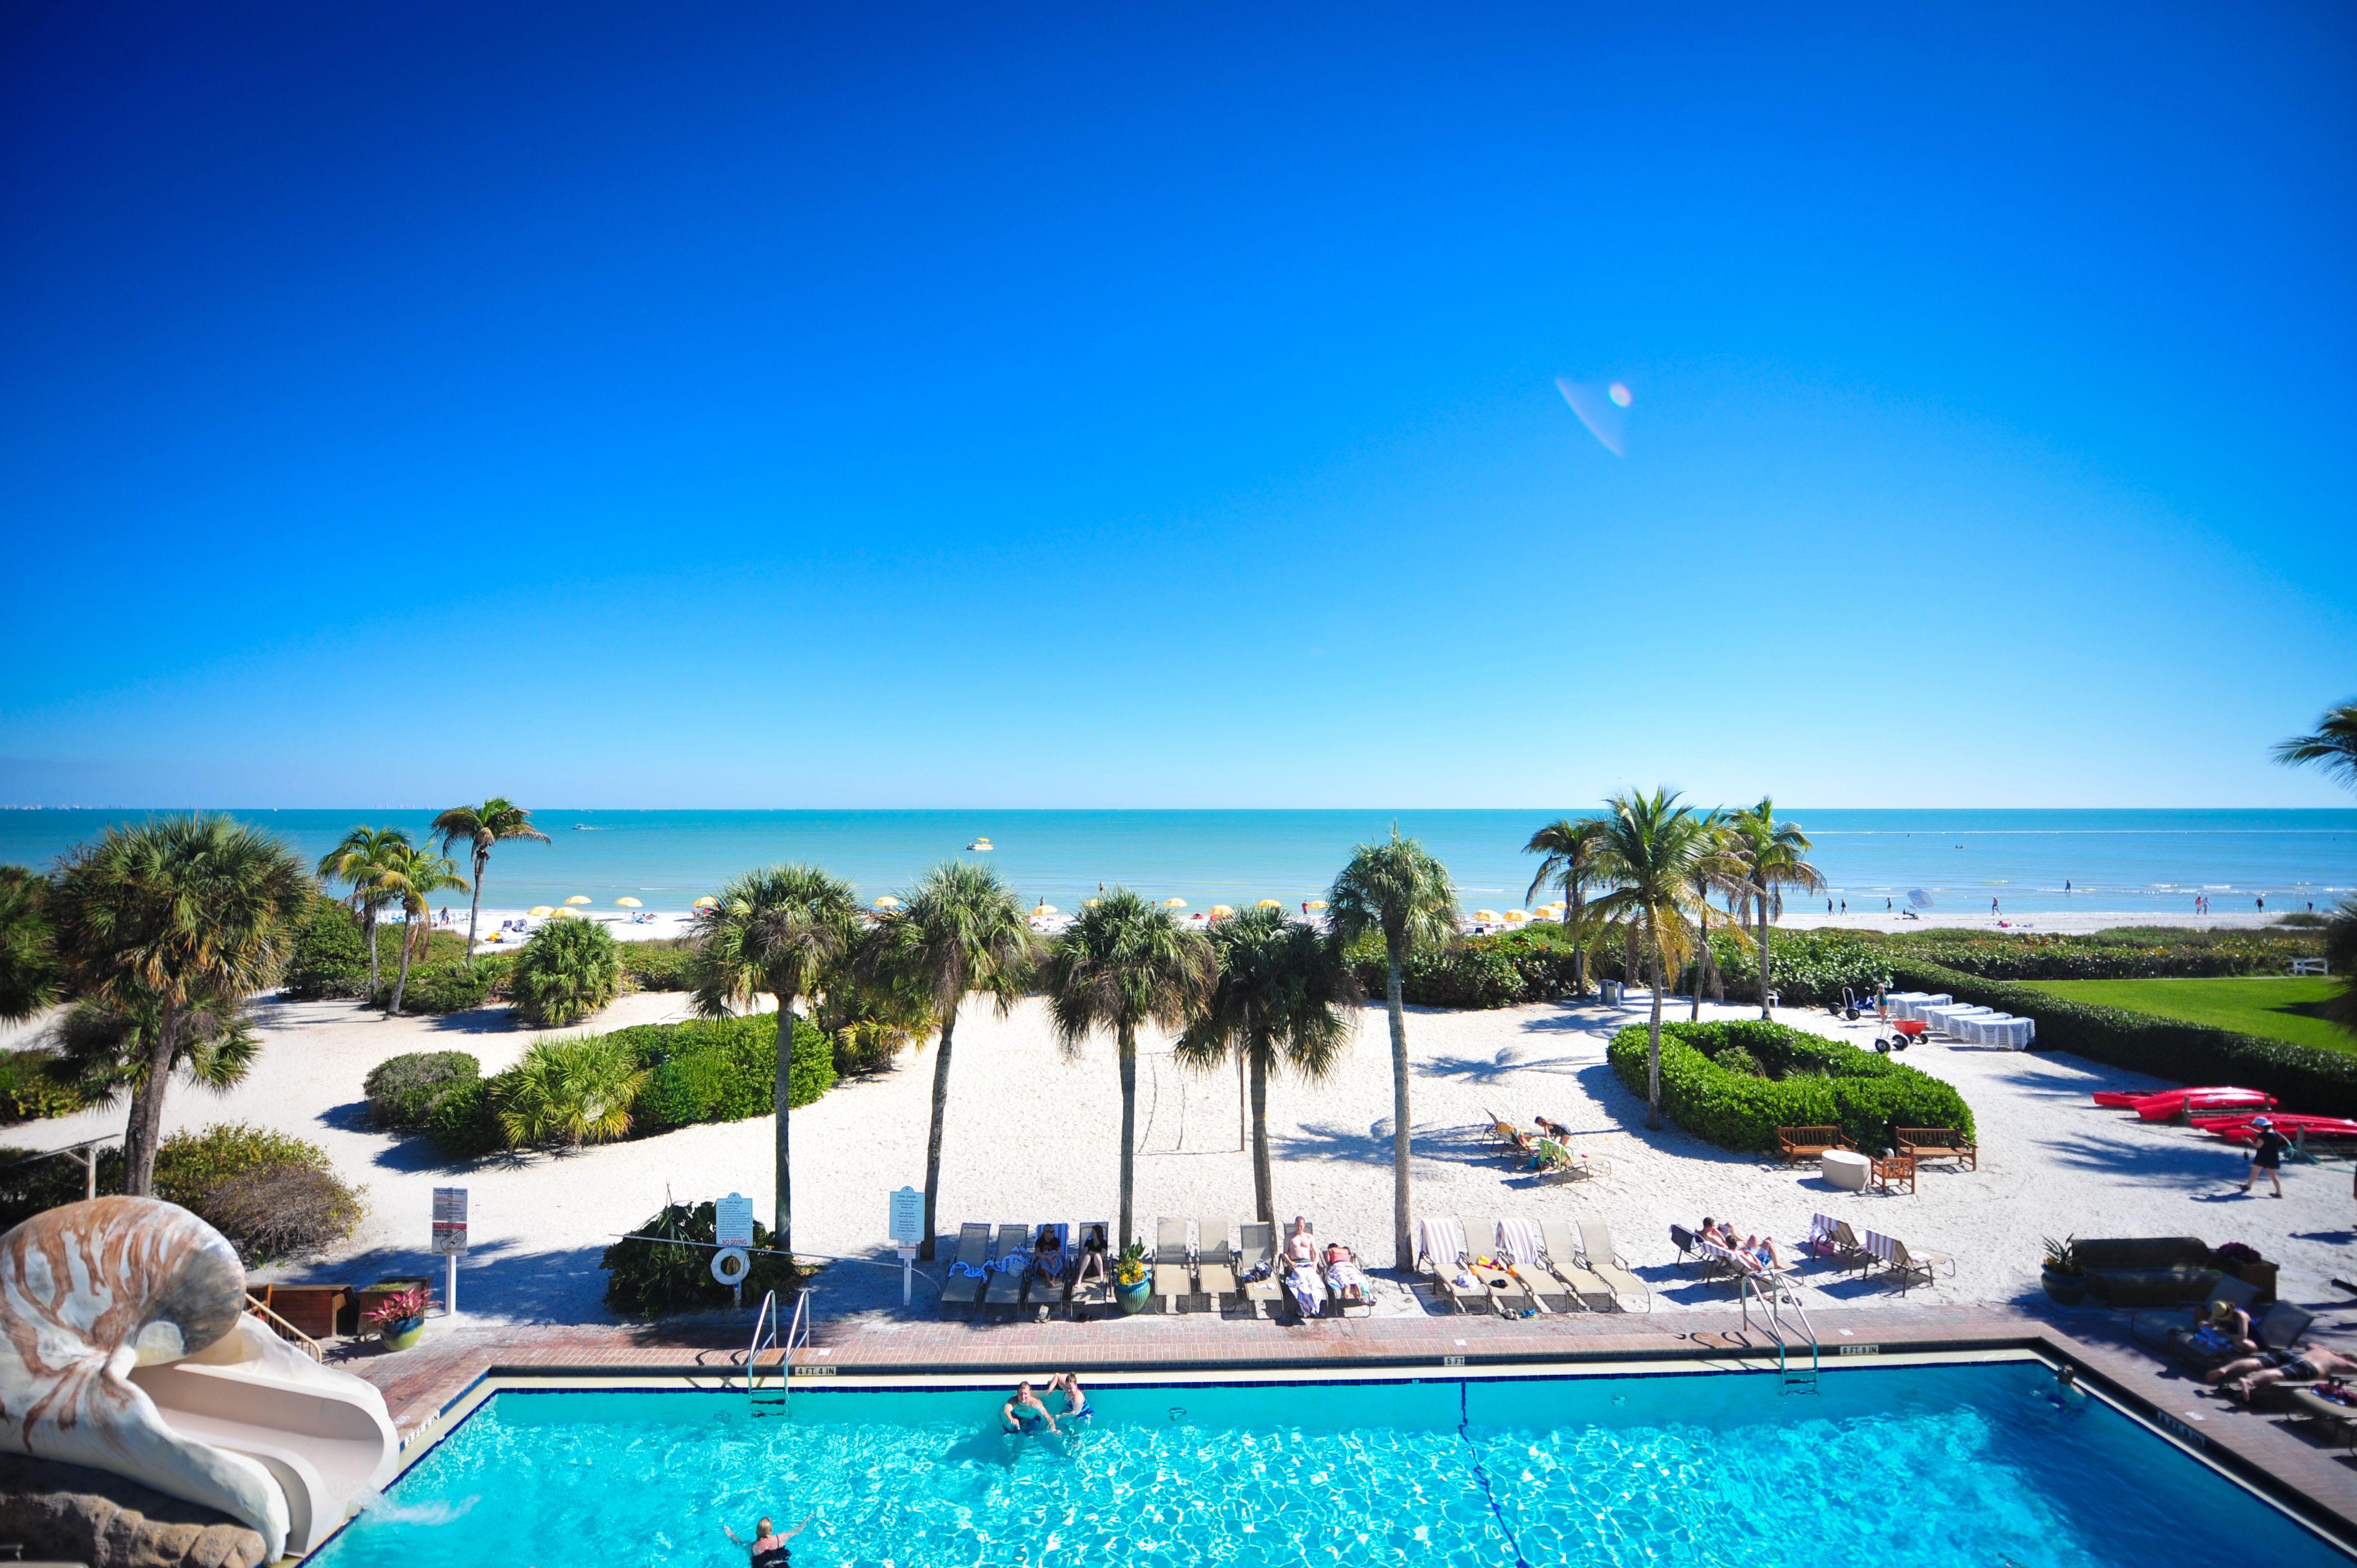 Sanibel Island Resorts: Sundial Resort Sanibel Island Florida Www.brandonmcnabb